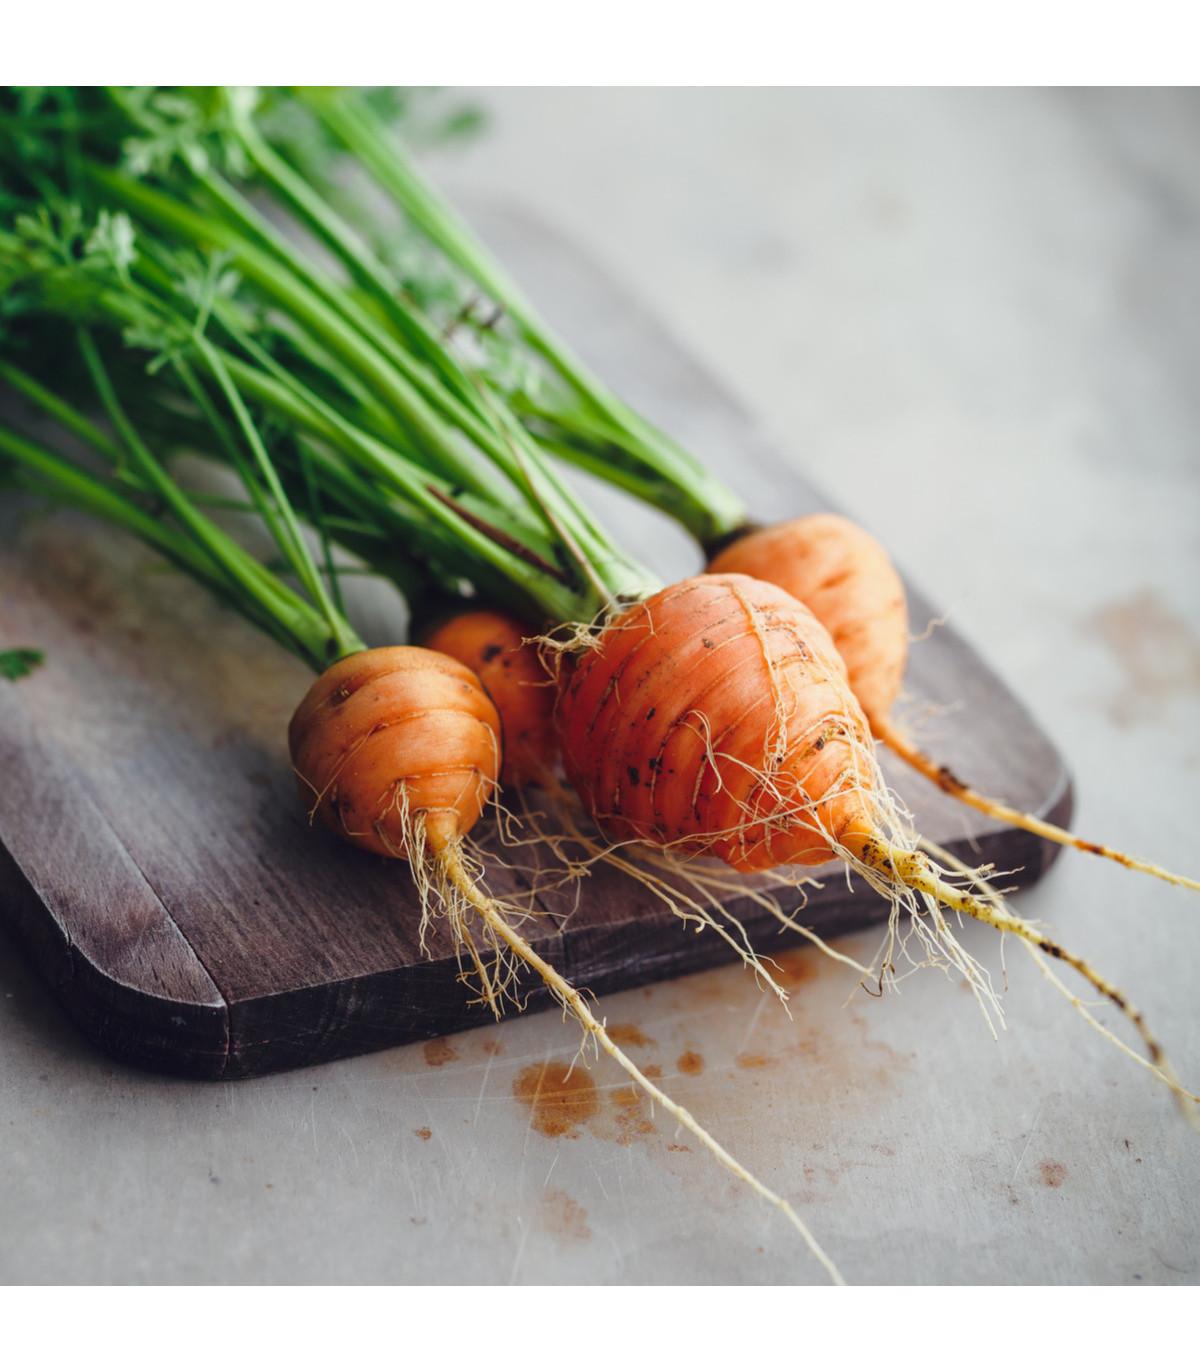 Mrkev kulatá k rychlení - Pariser Markt - semena Mrkve - 1 gr